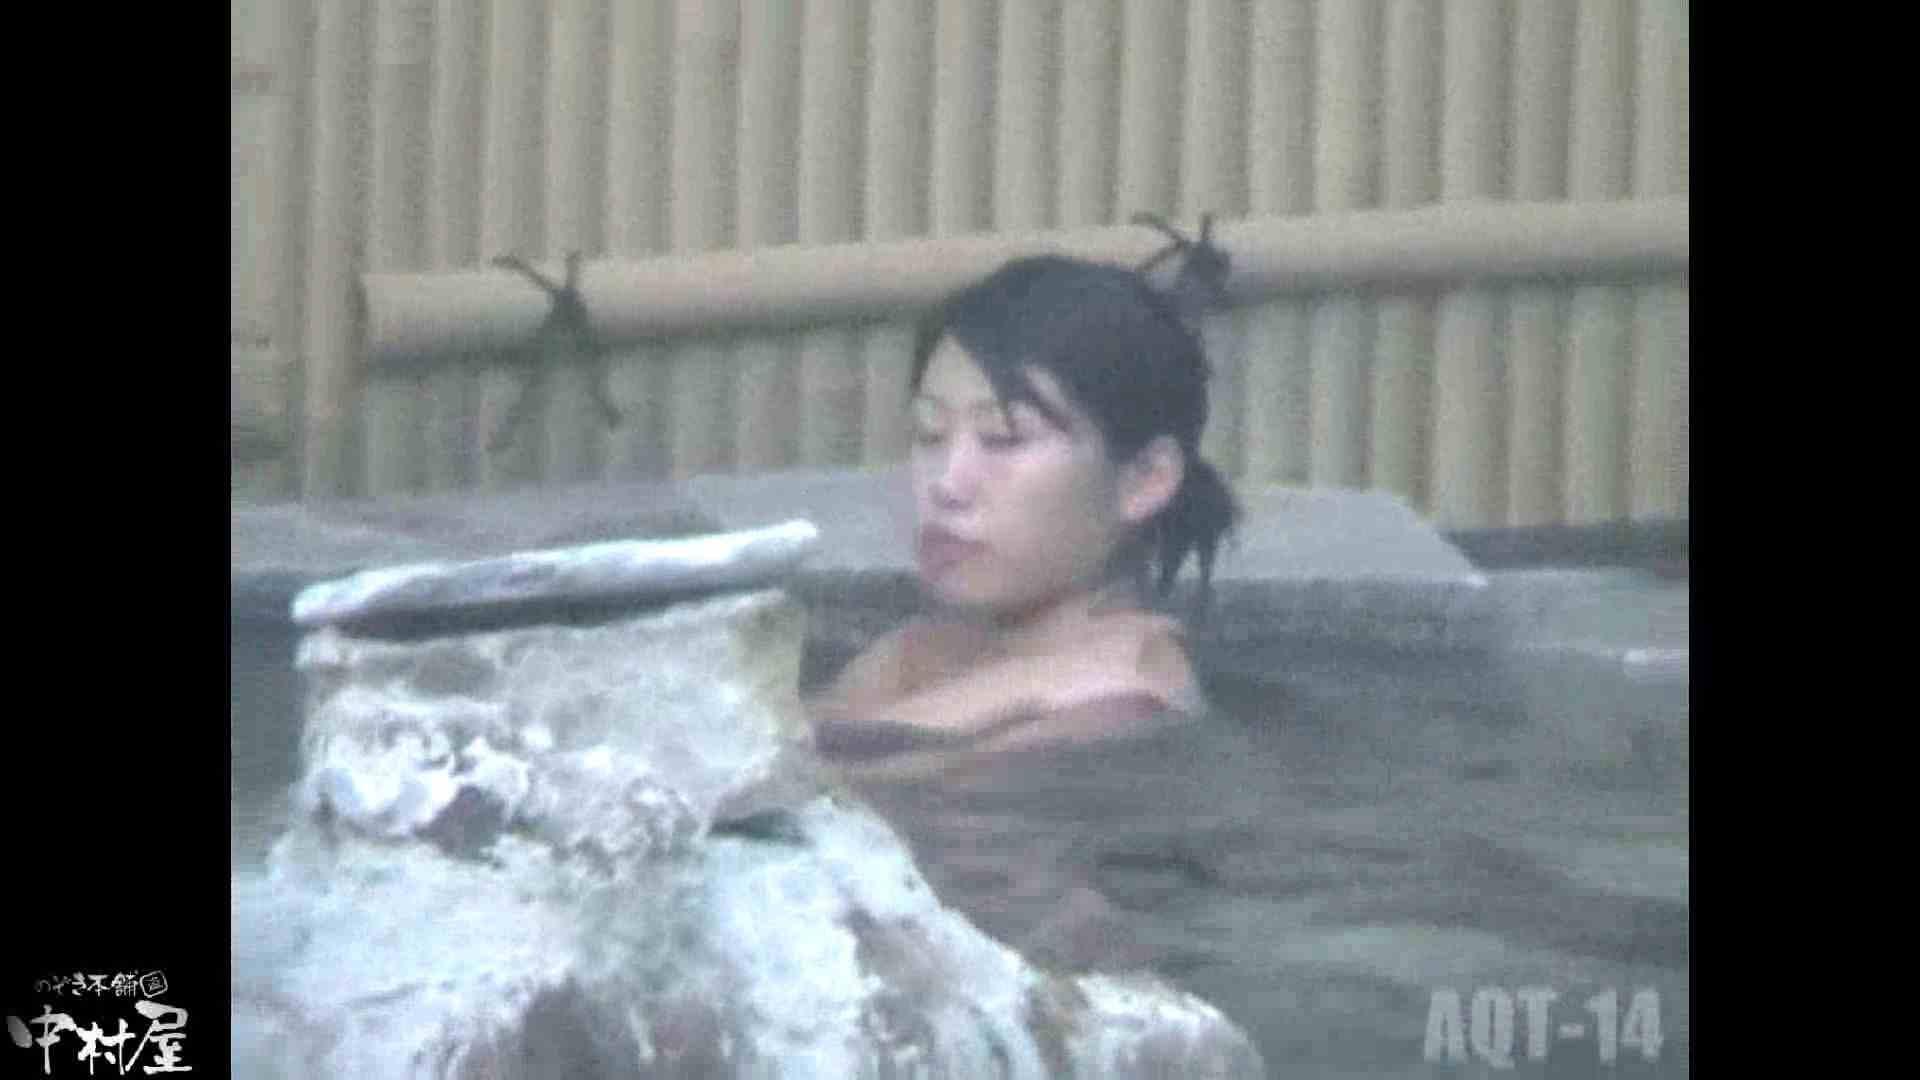 Aquaな露天風呂Vol.878潜入盗撮露天風呂十四判湯 其の一 潜入画像   露天  59画像 58